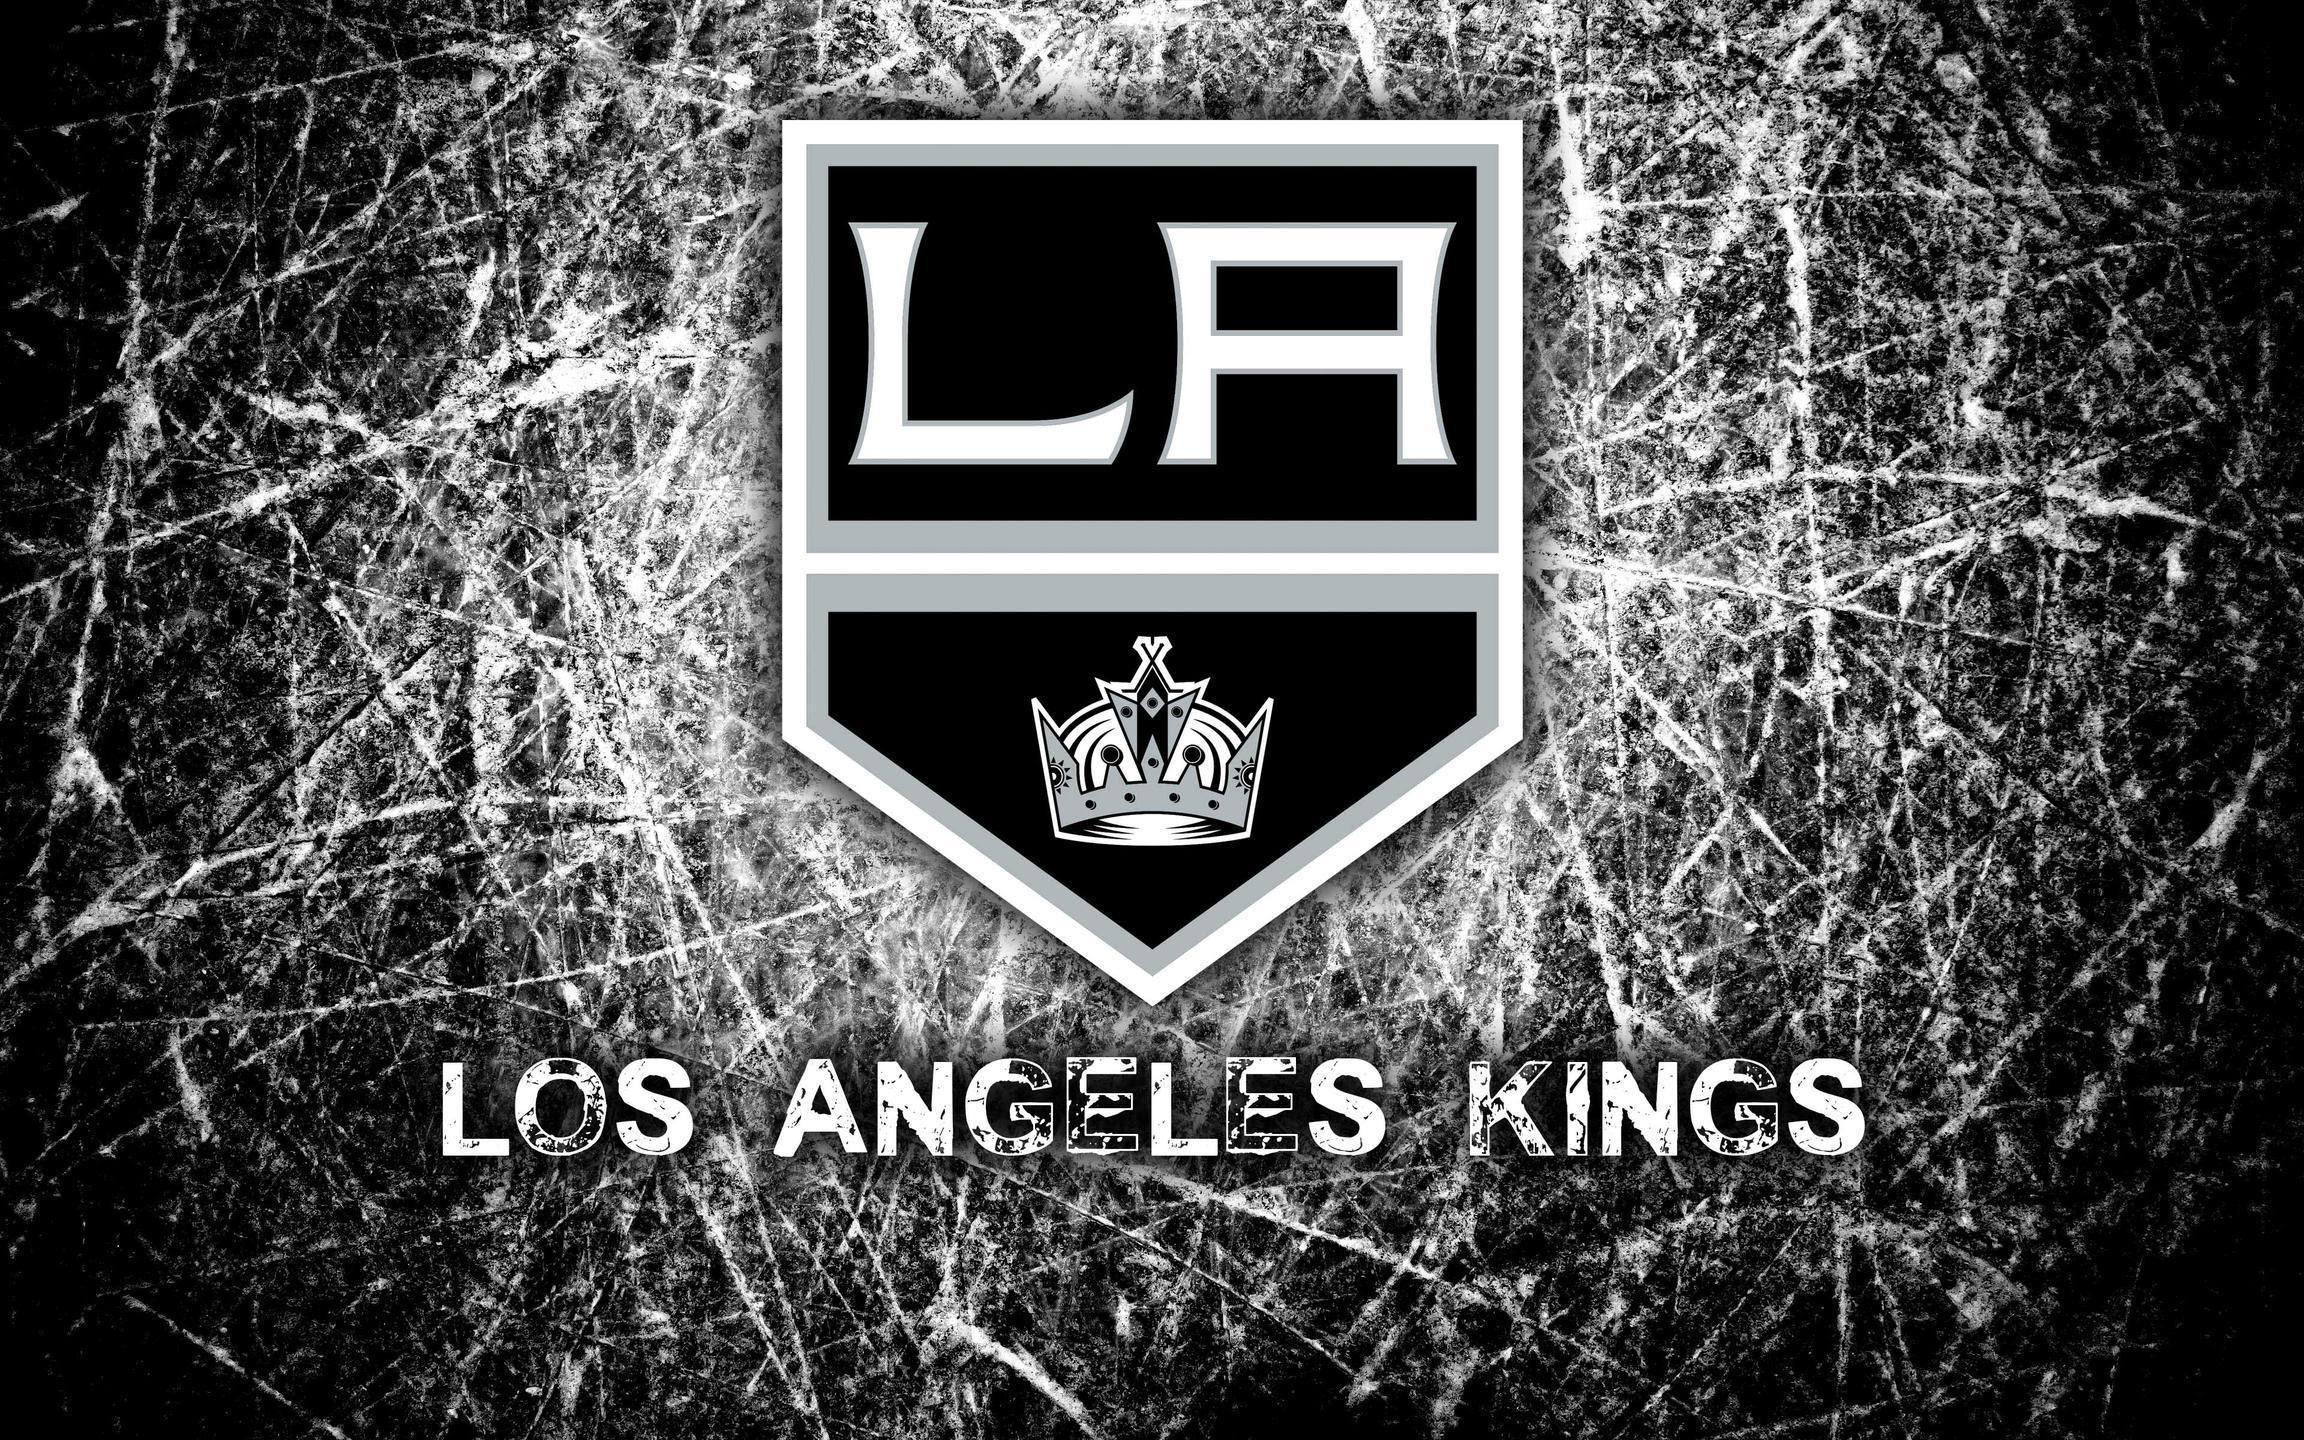 La Kings Logo Wallpaper 72 Images